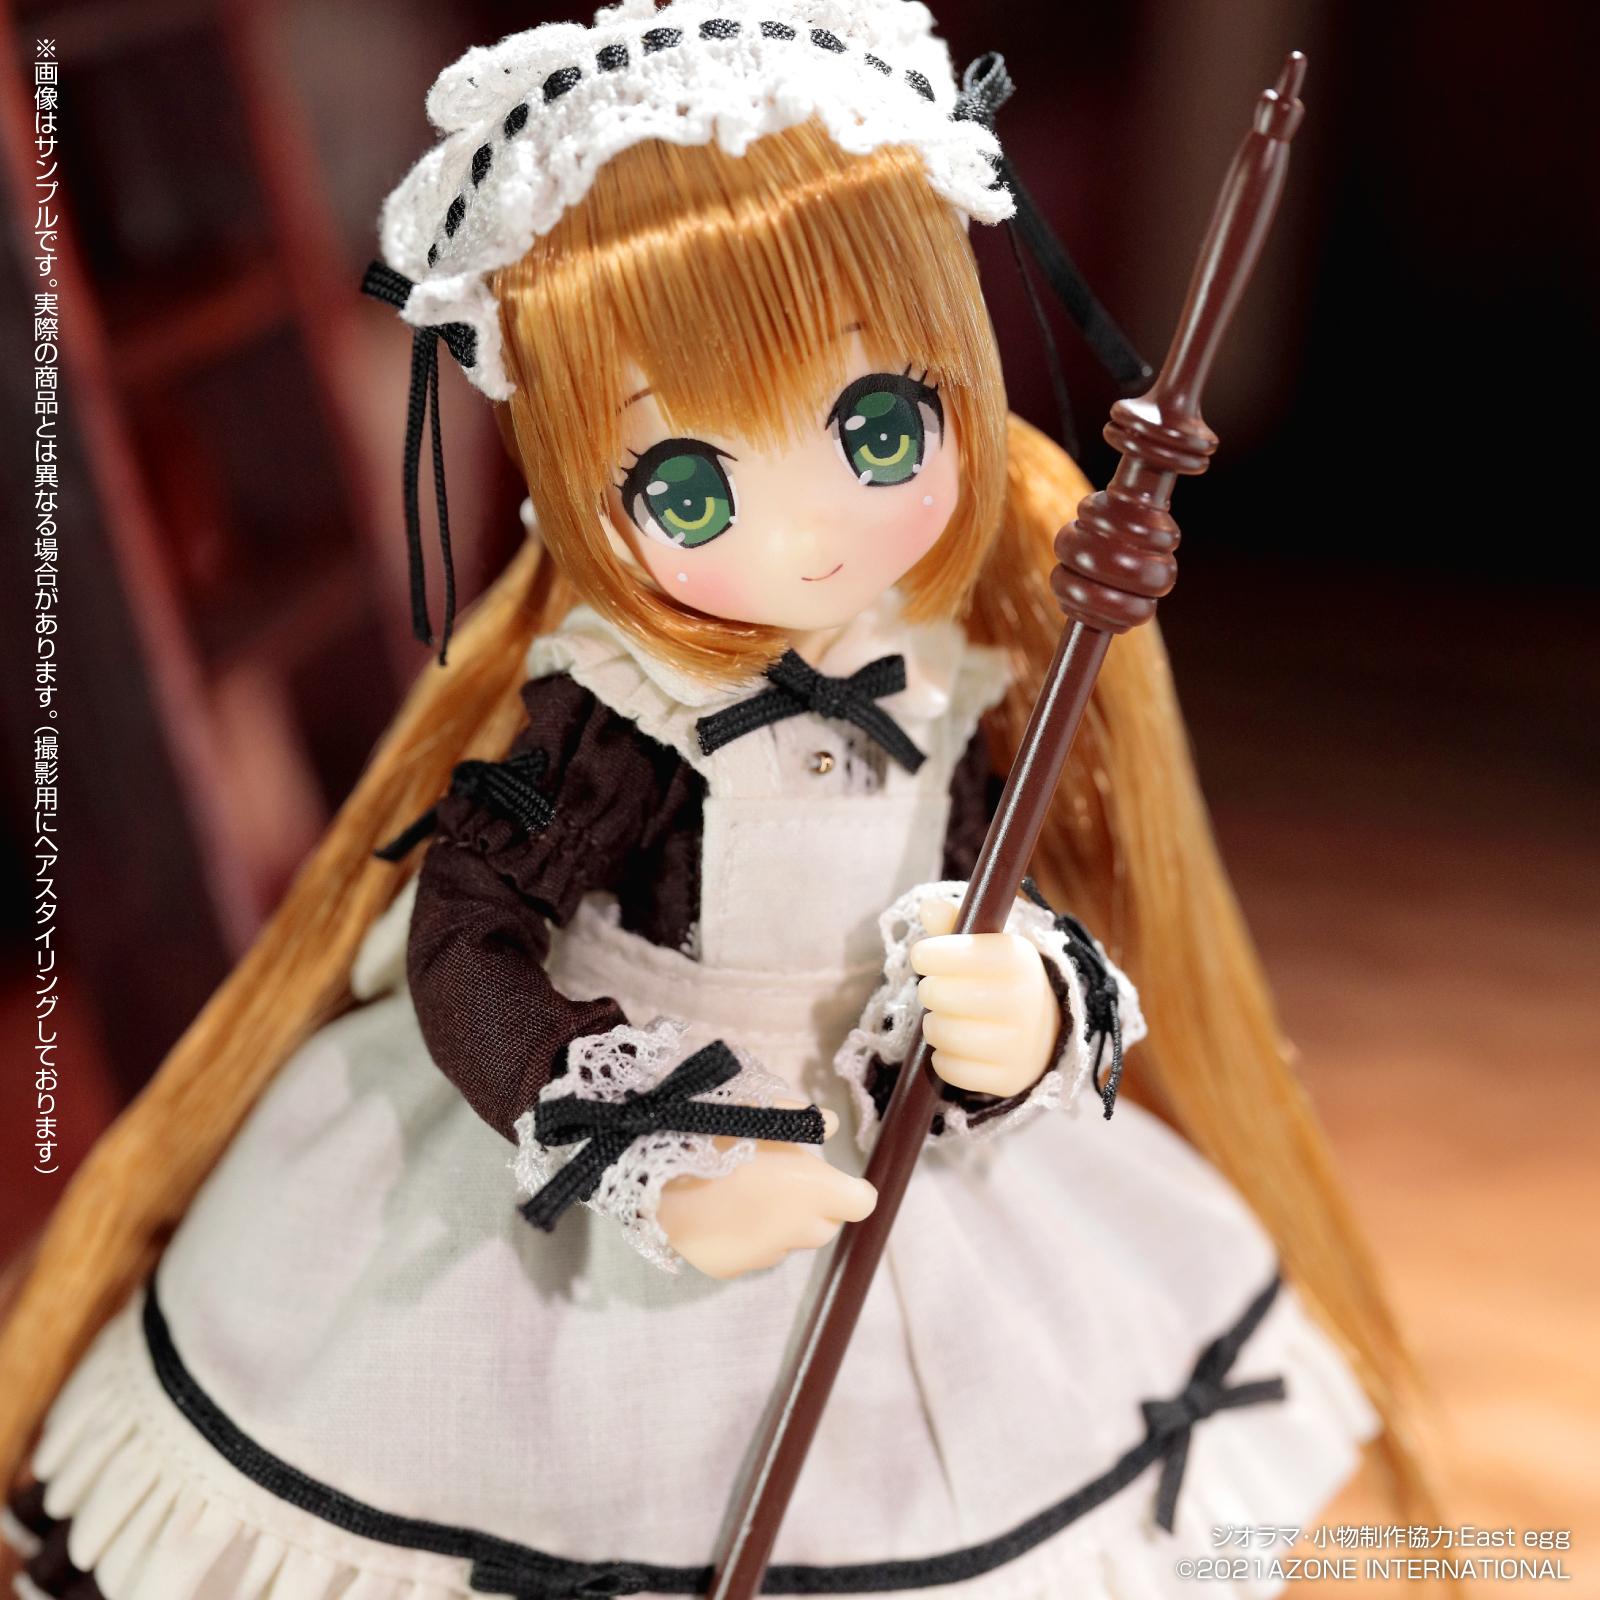 Lil'Fairy ~ちいさなお手伝いさん~『リプー 7th anniv.(ノーマル口ver.)』1/12 完成品ドール-022